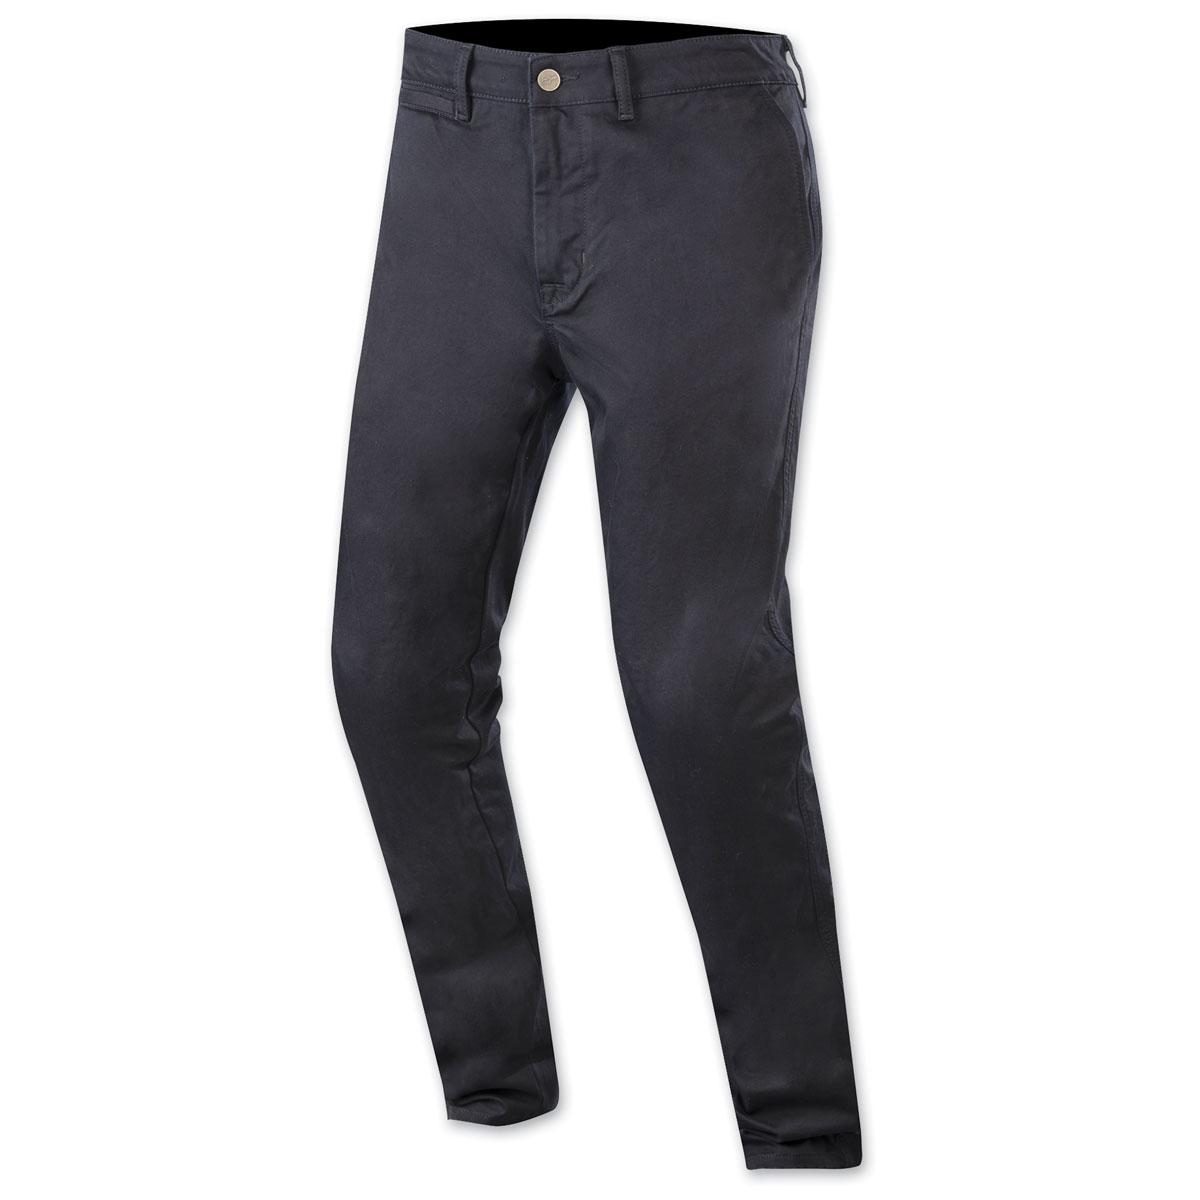 Alpinestars Men's Motochino Navy Blue Pants